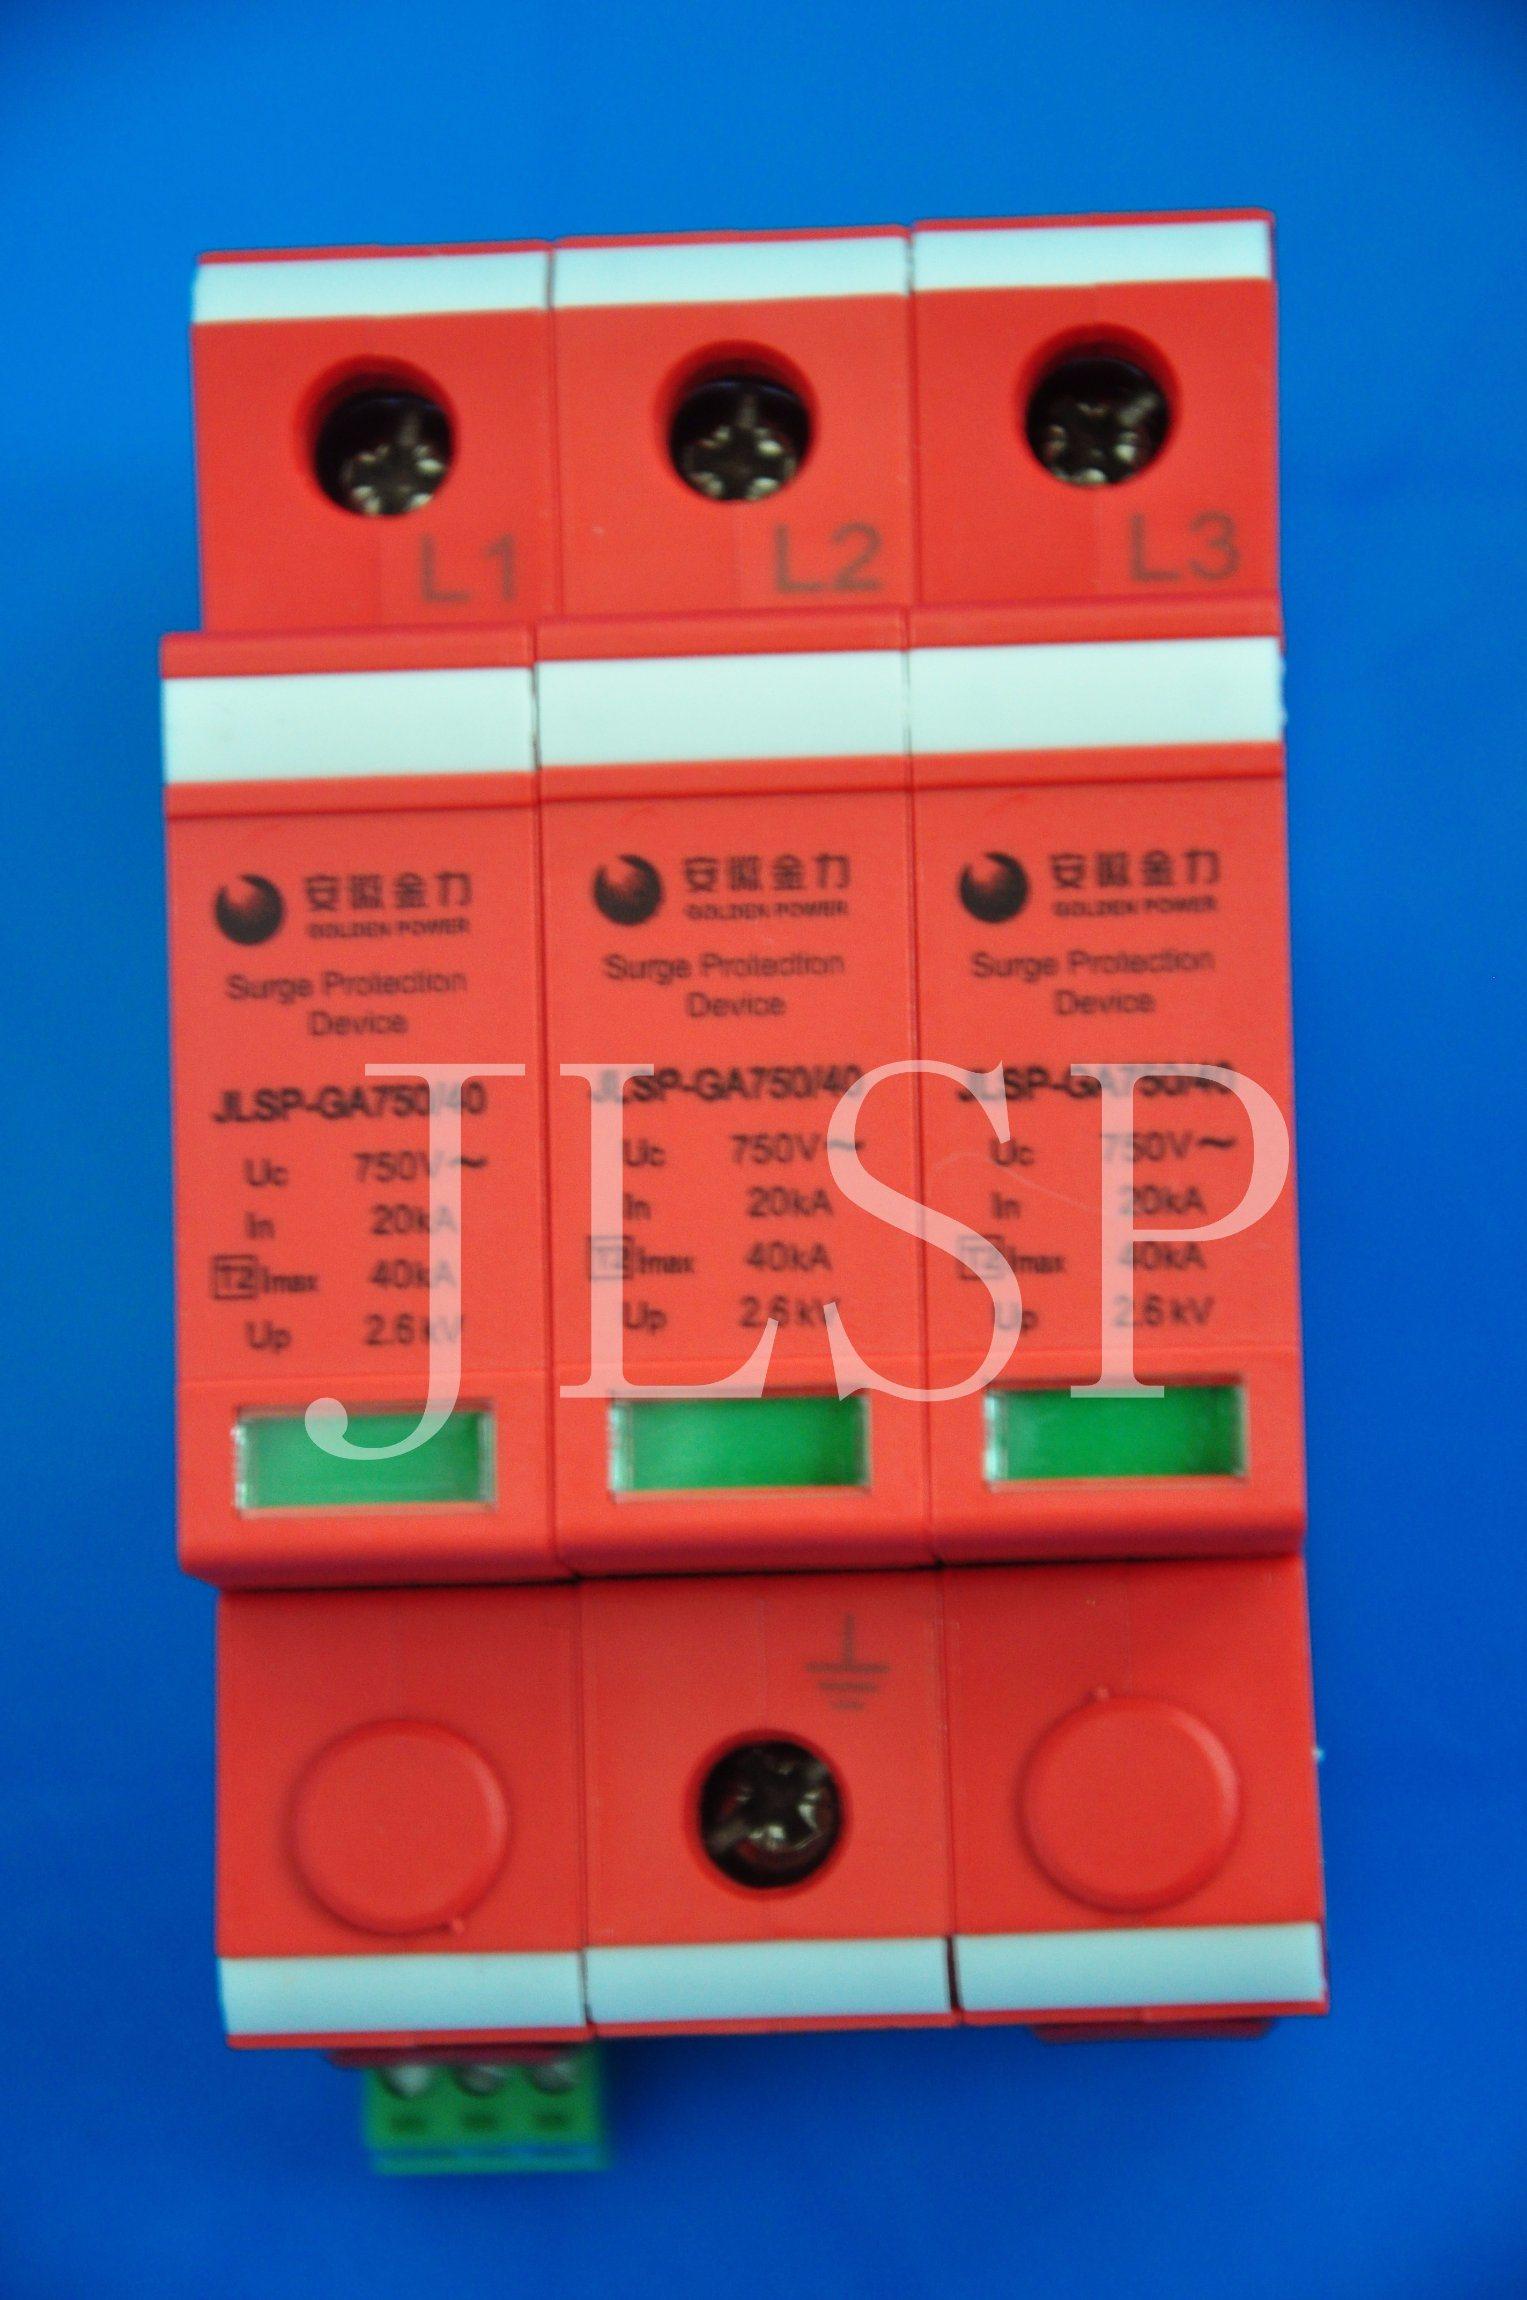 PV Application 20-40ka Solar 3p DC 1000V, Jlsp-Ga750-40, SPD, Surge Protector, 17005